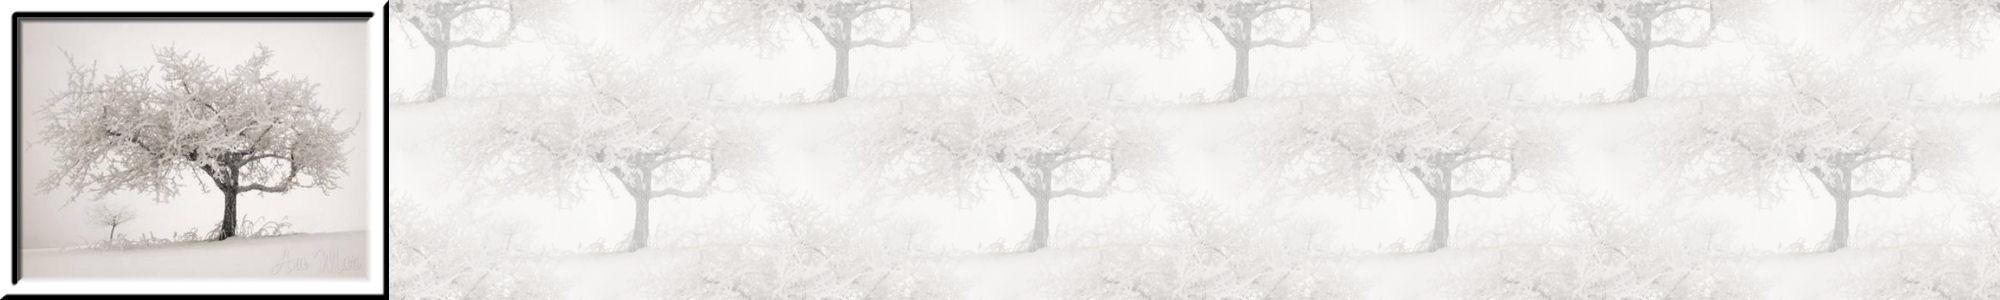 Fondo IM campos_nieve_dia_003.imf